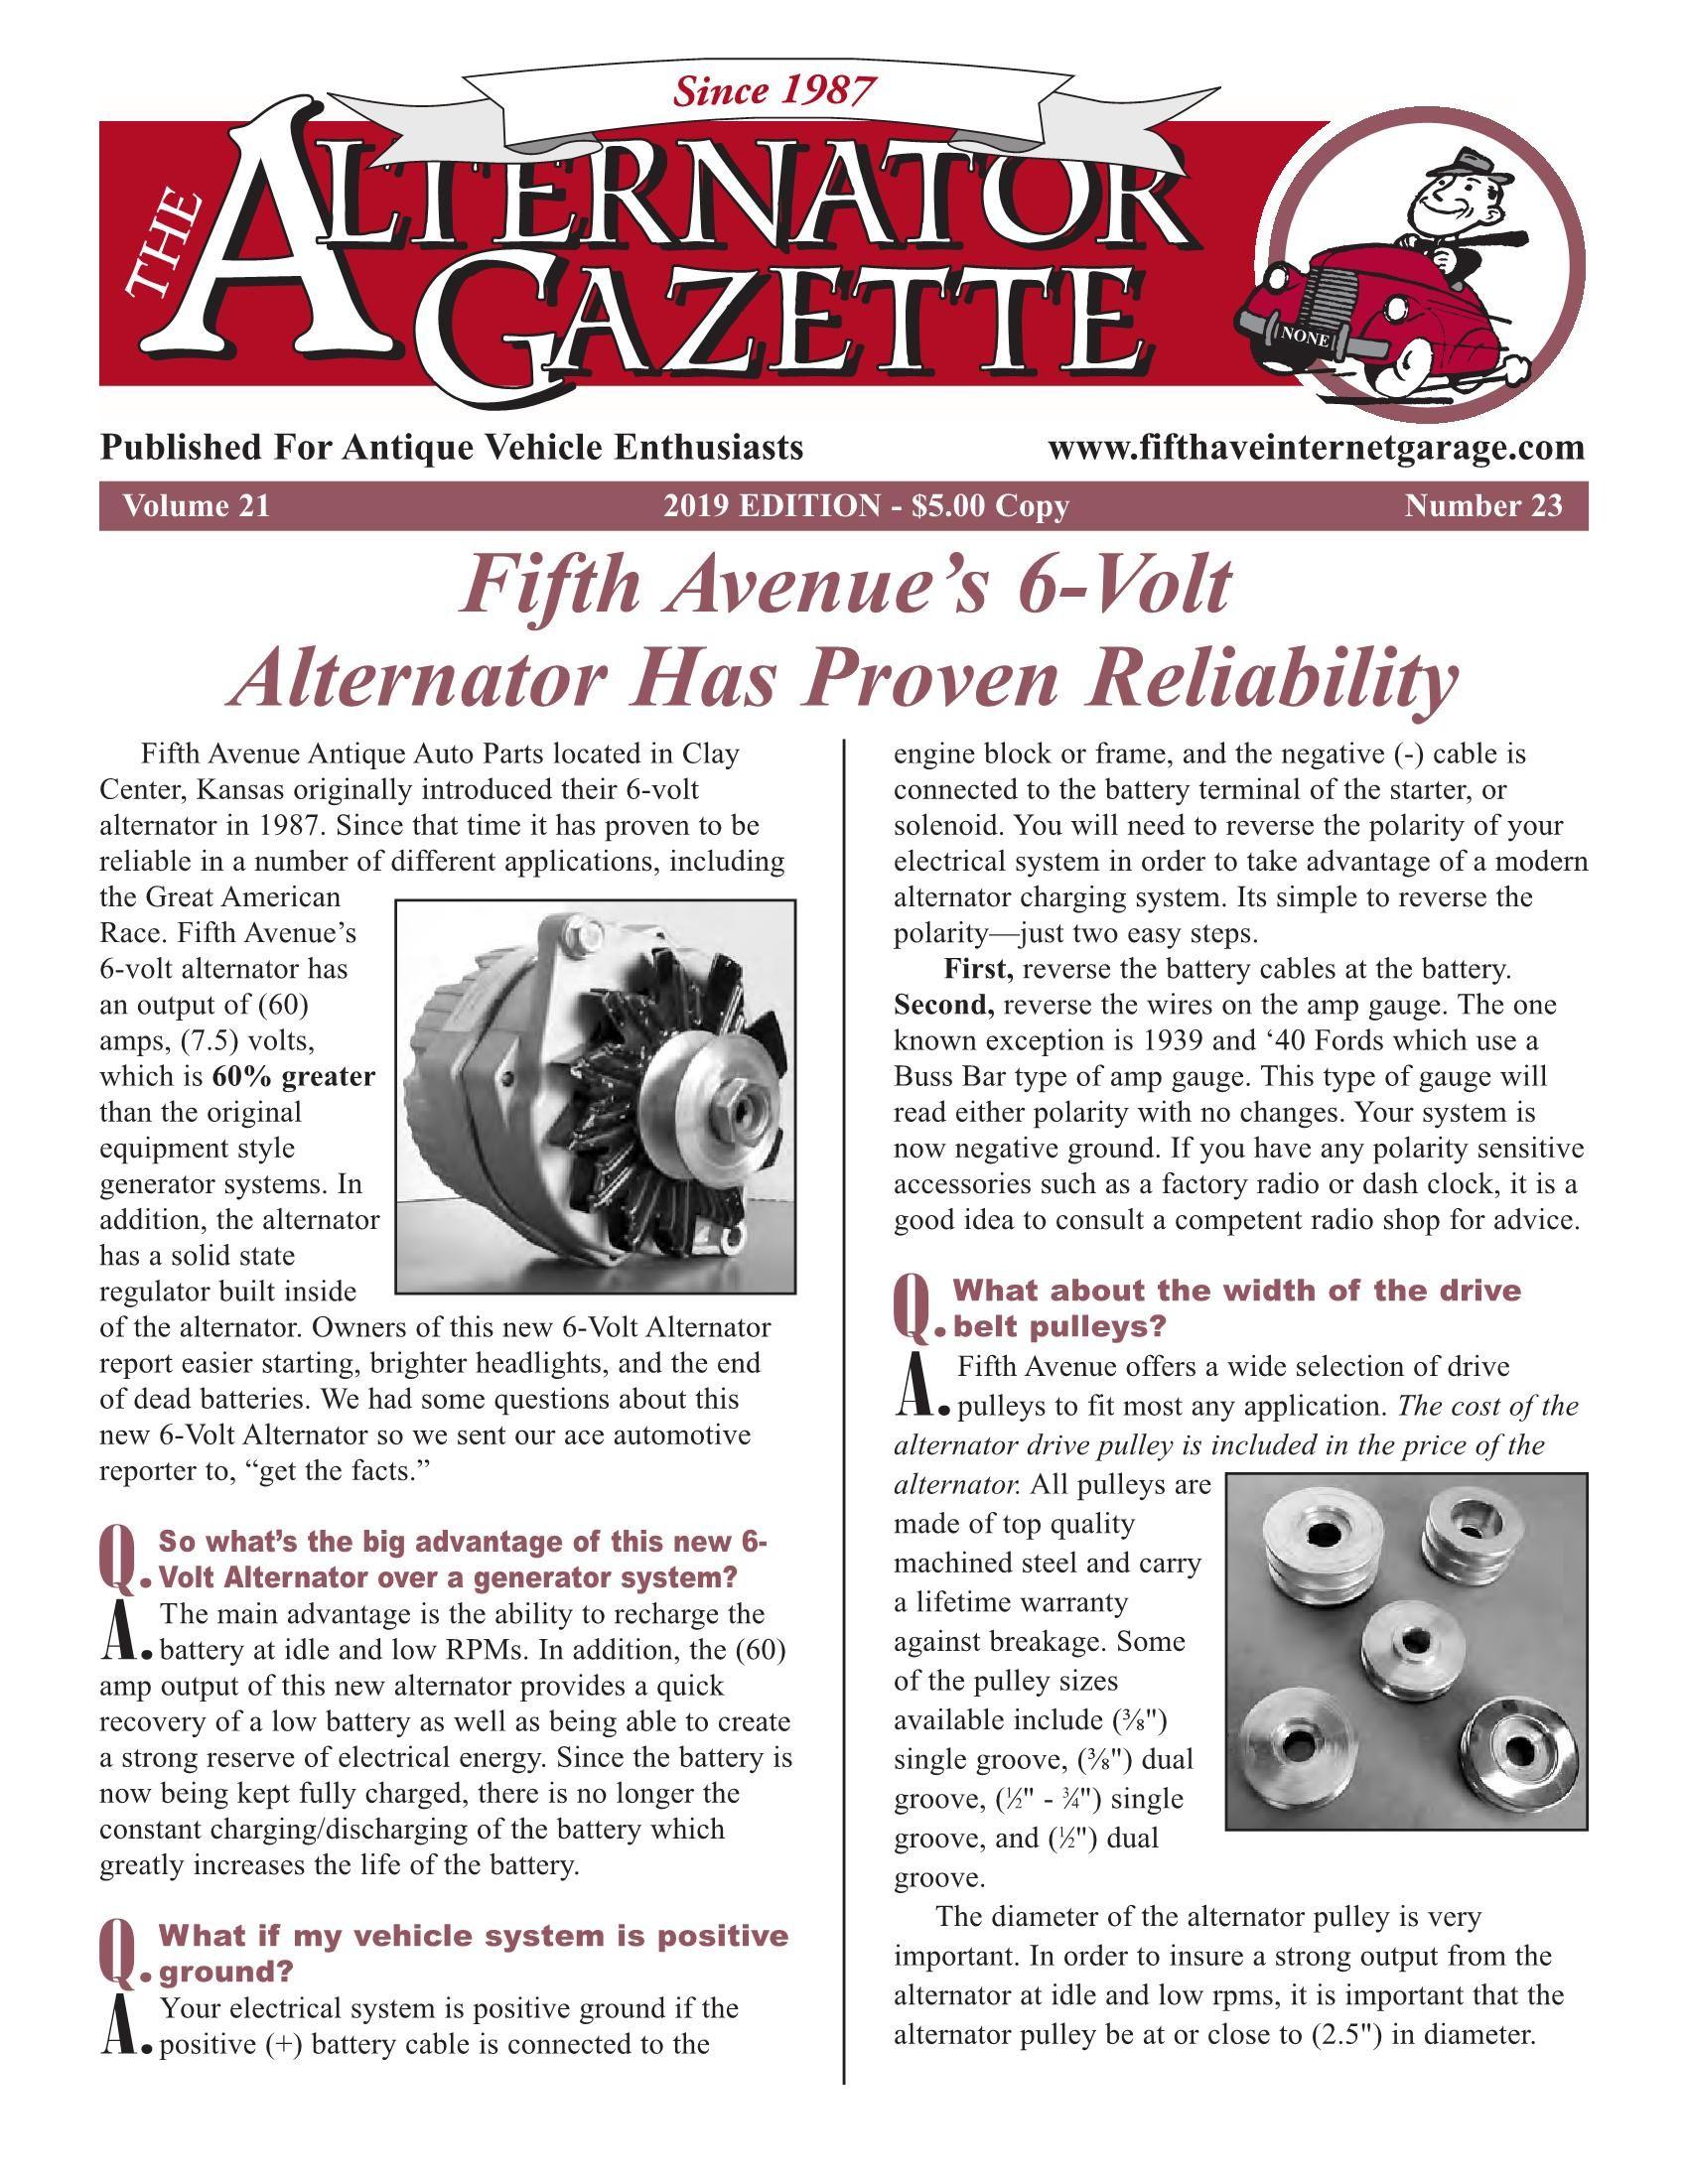 small resolution of alternator gazette